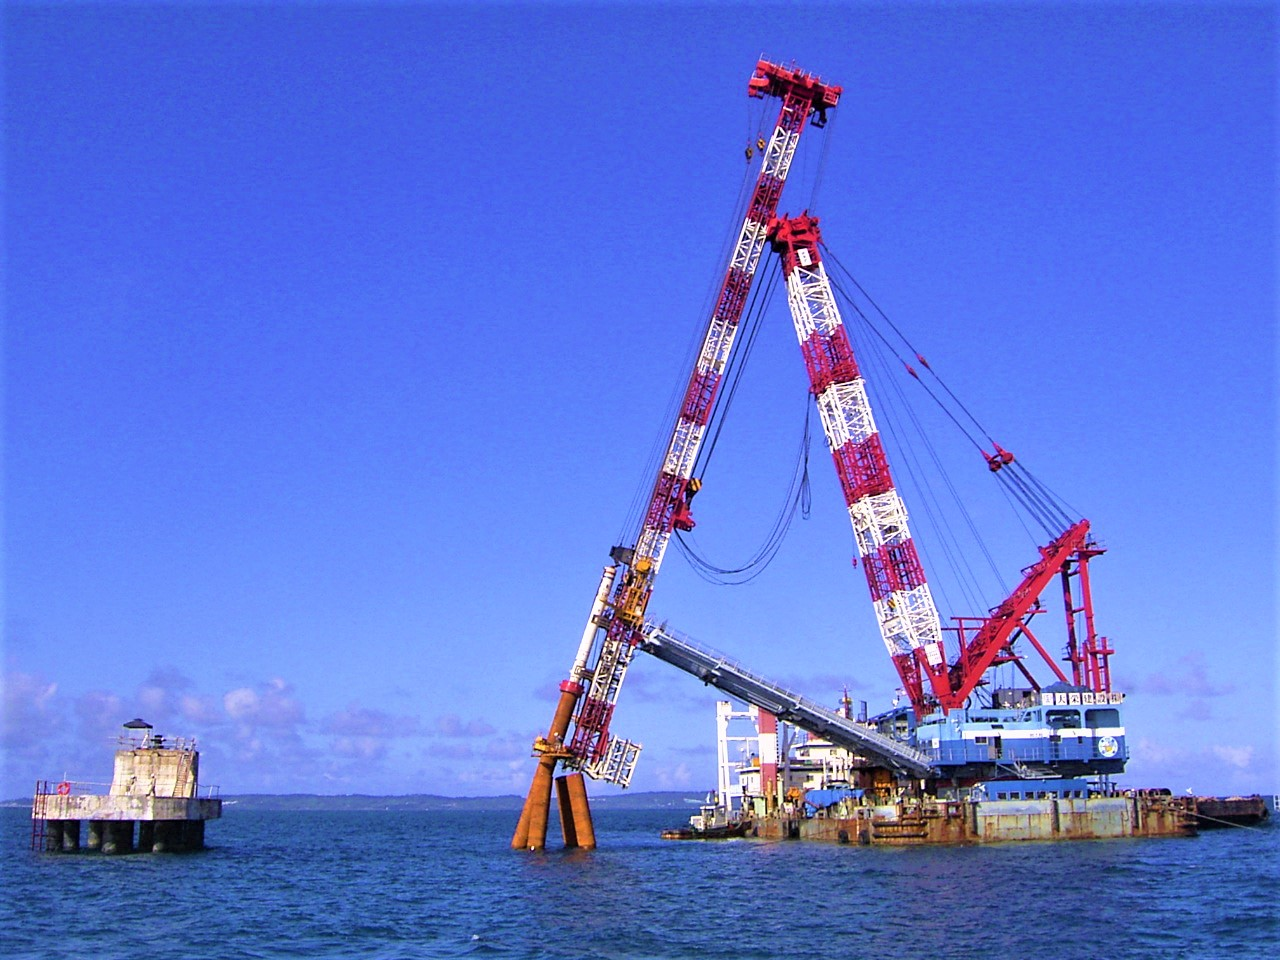 DT-K Series / Multi-Purpose Crane (Pile-Driver)